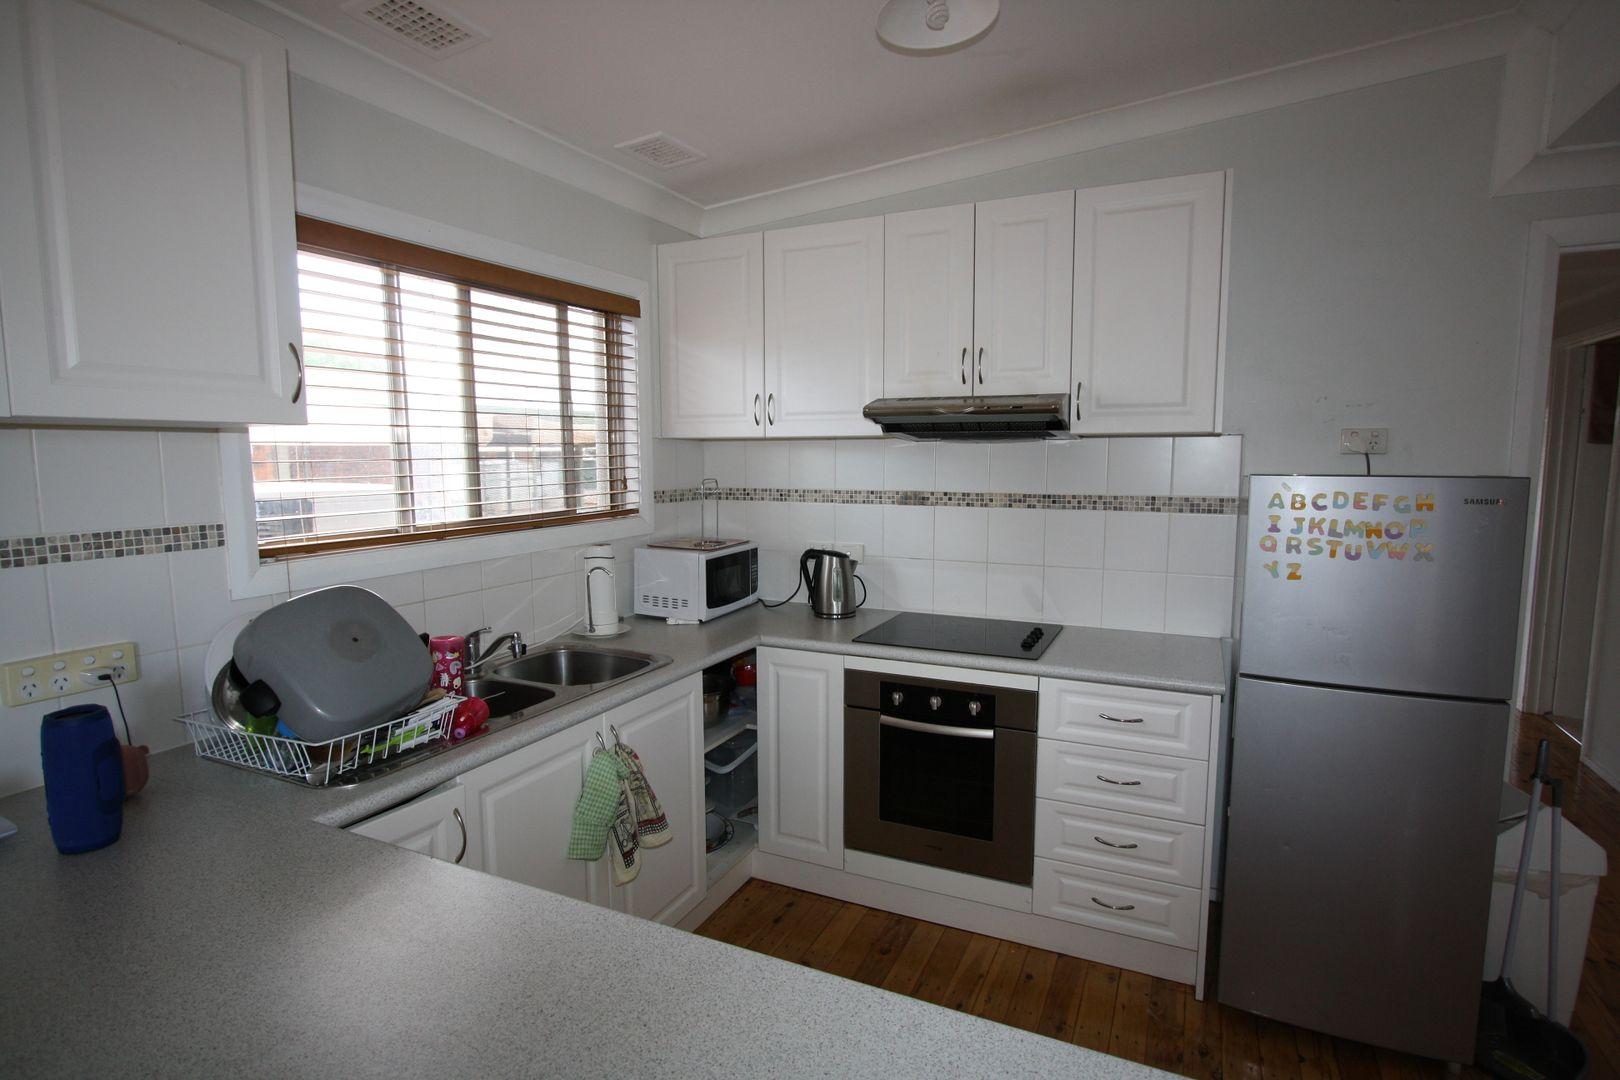 14 Woodiwiss Avenue, Cobar NSW 2835, Image 1